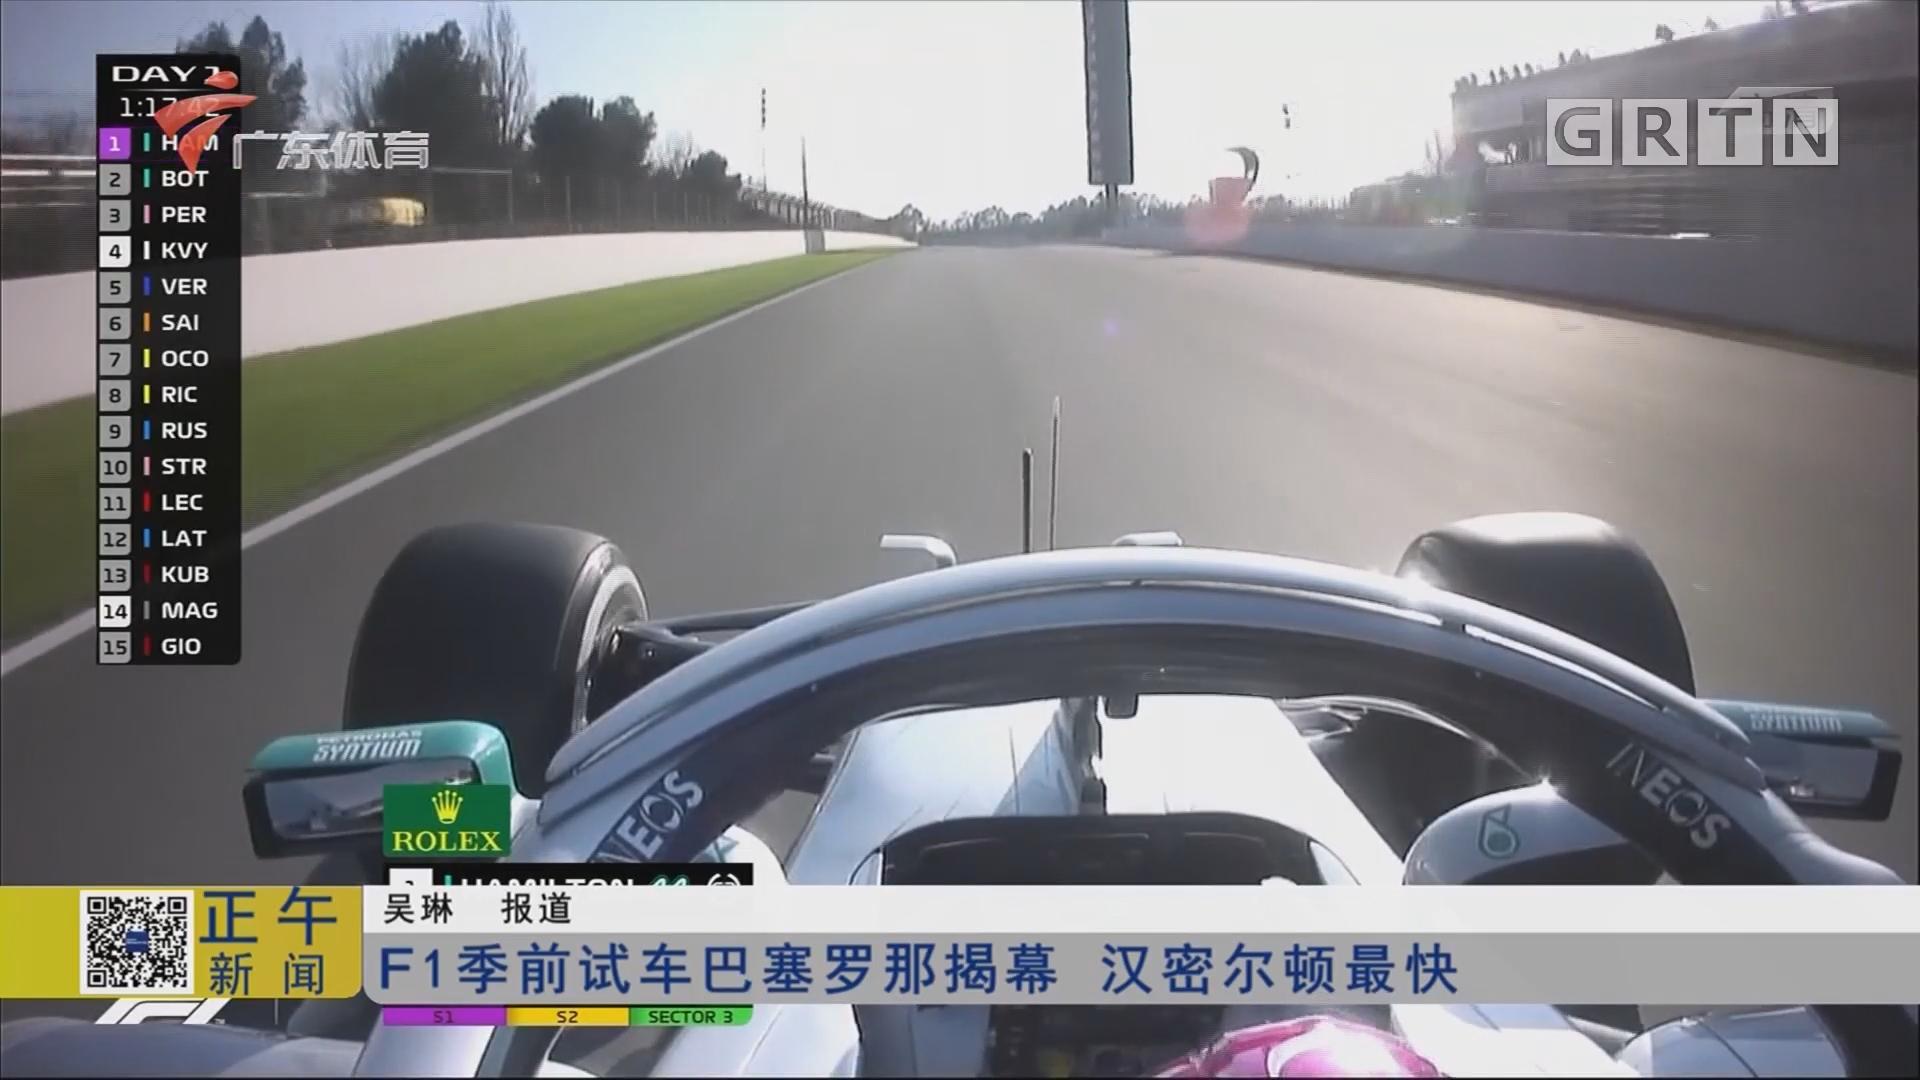 F1季前试车巴塞罗那揭幕 汉密尔顿最快